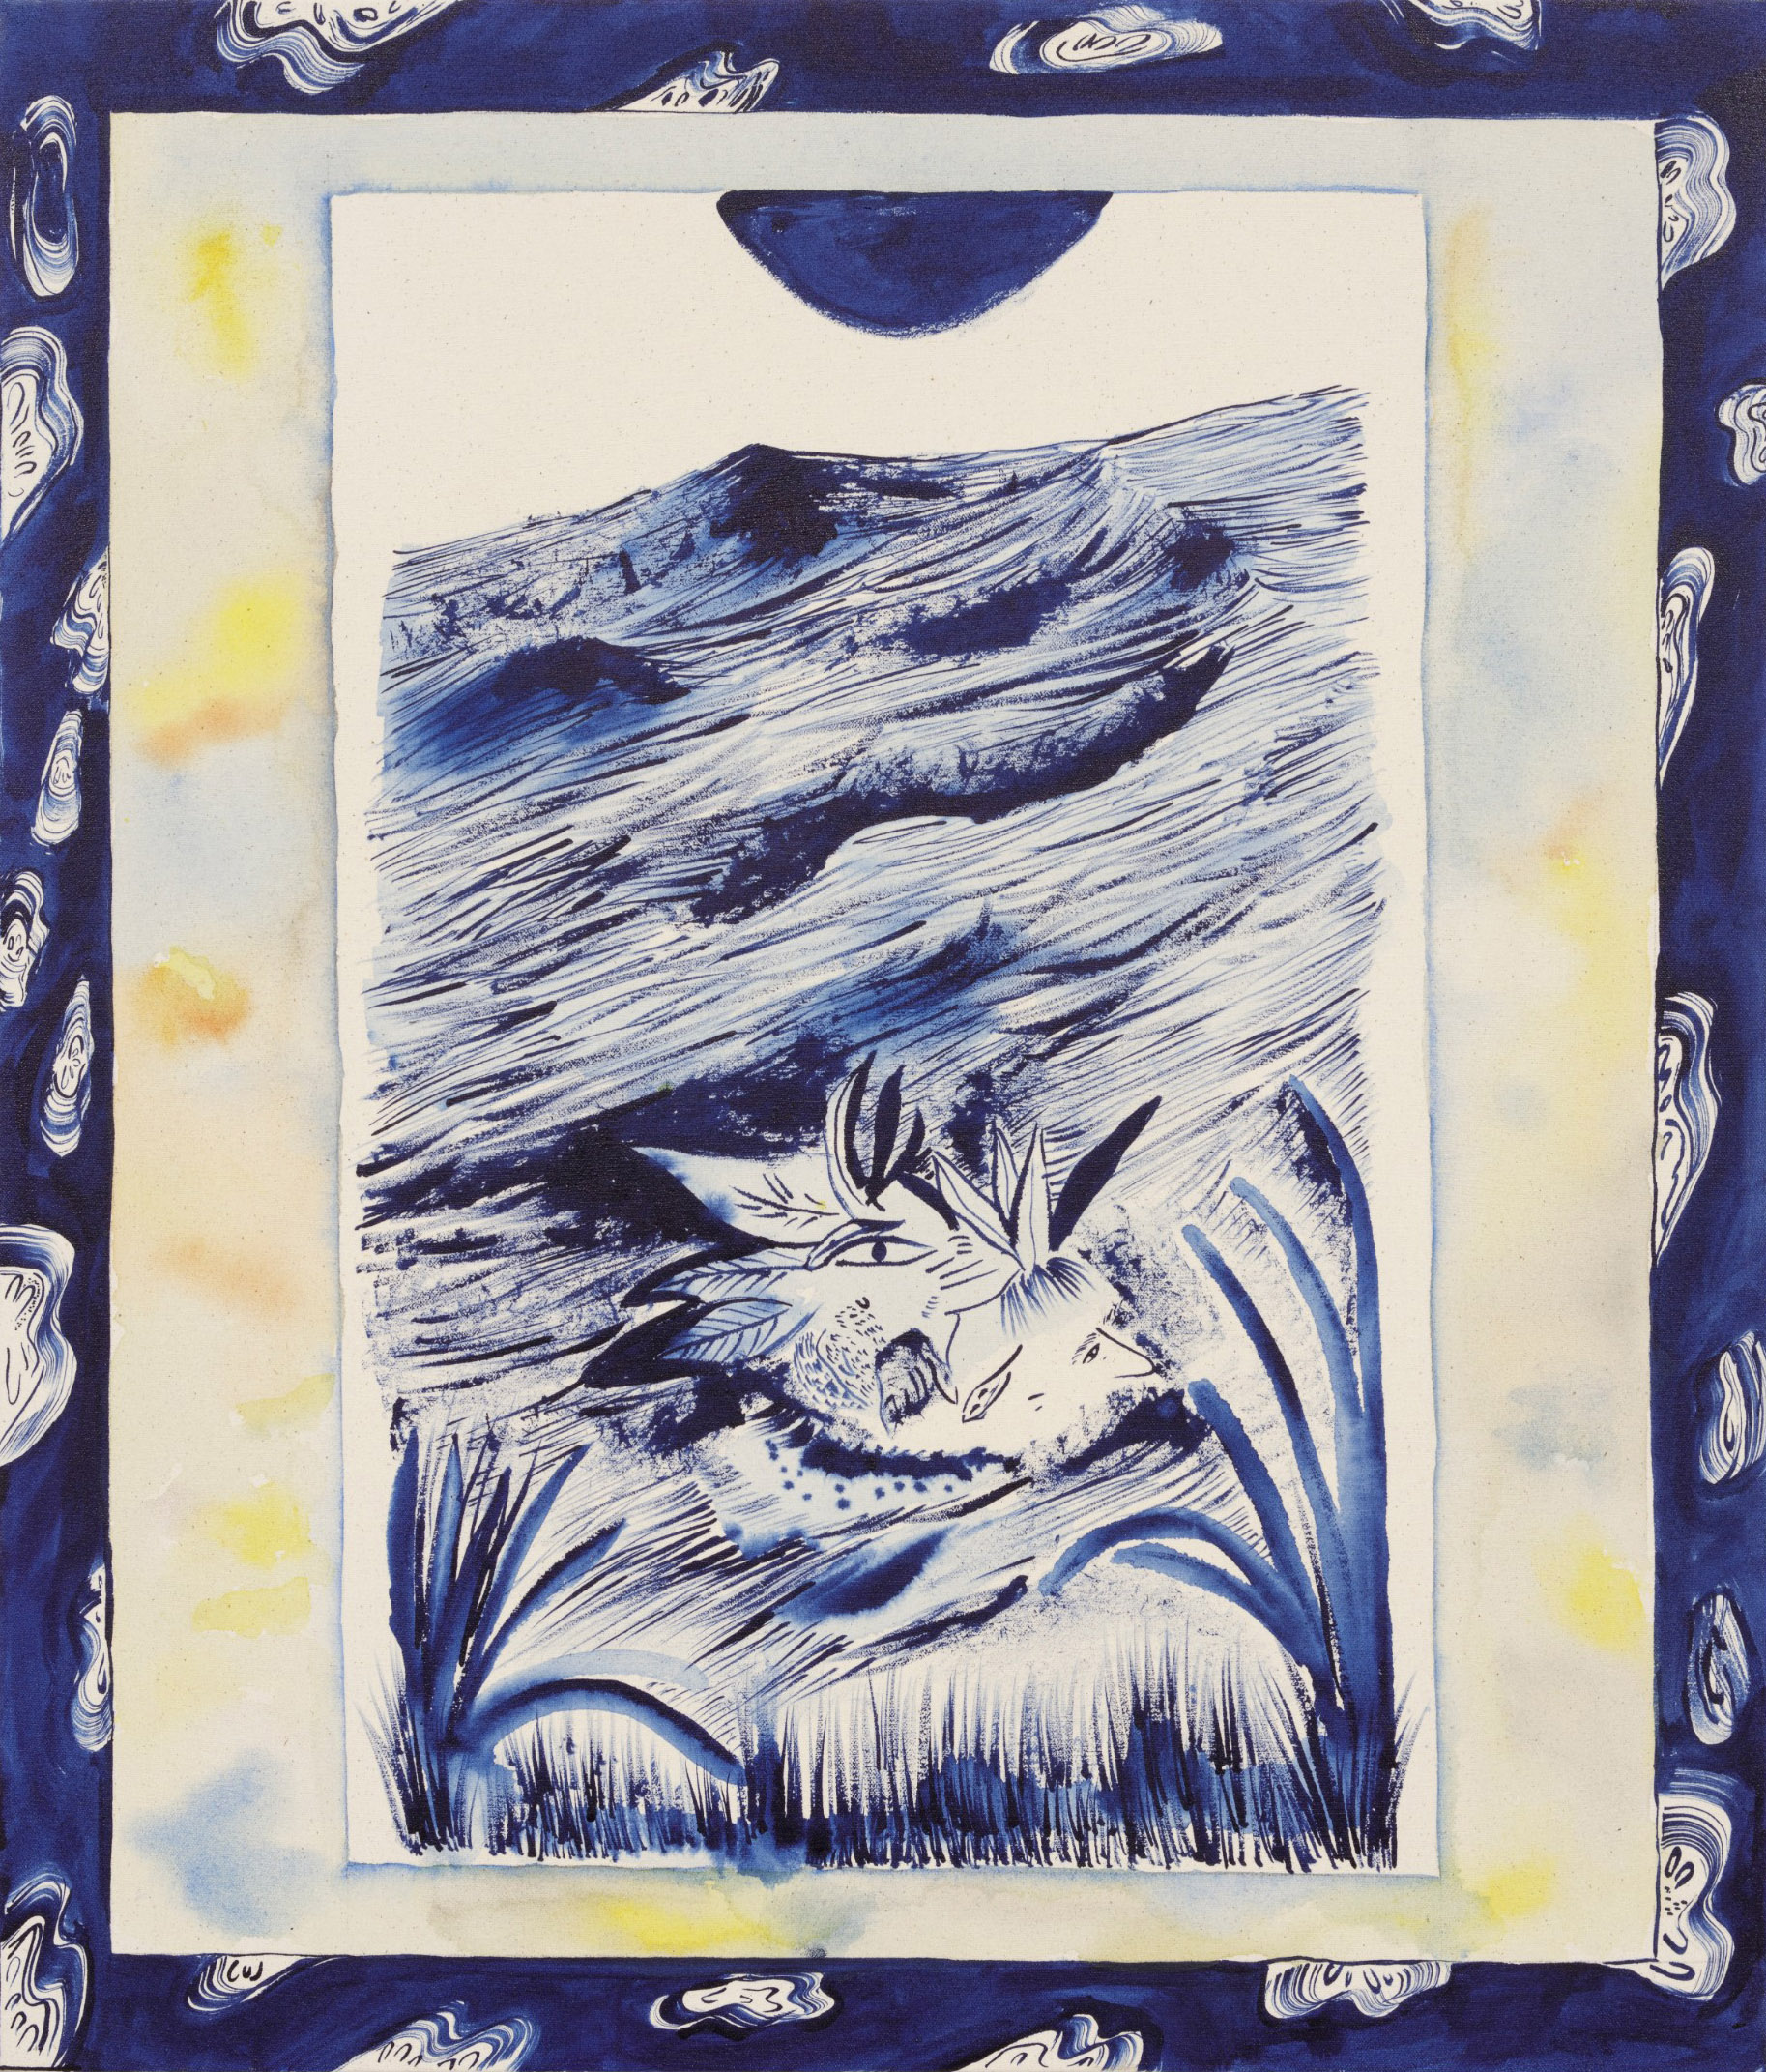 Jamie Felton. <em>Head Floating Through the River</em>, 2018. Ink on canvas, 30 1/4 x 25 3/4 inches (76.8 x 65.4 cm)